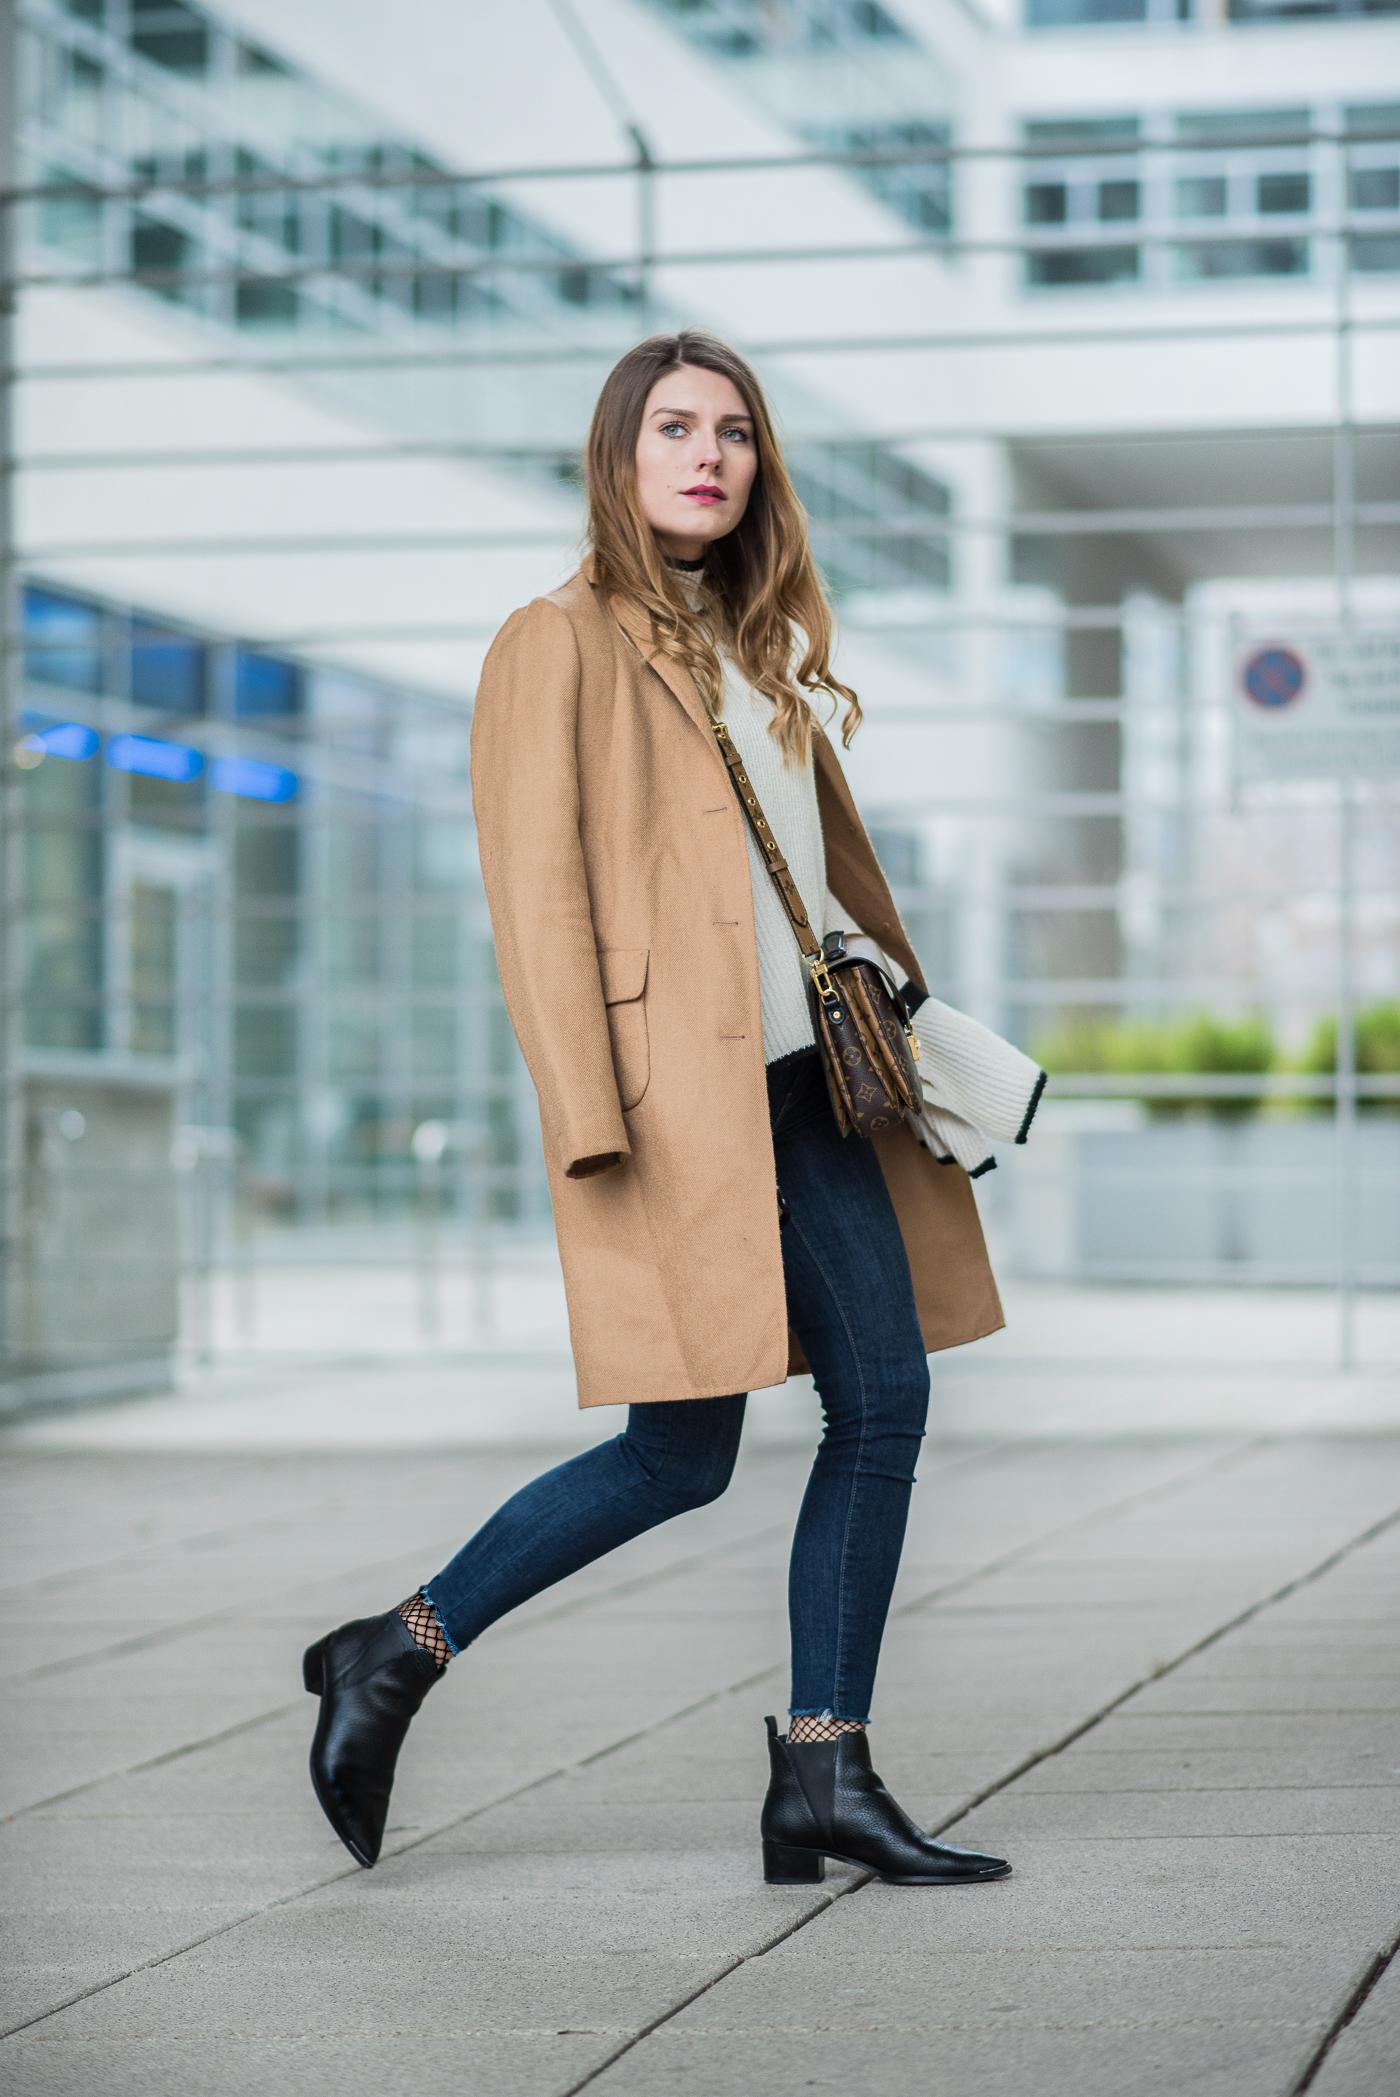 louis vuitton pochette metis bag  u2013 hoard of trends  u2013 personal style  u0026 fashion blog    modeblog